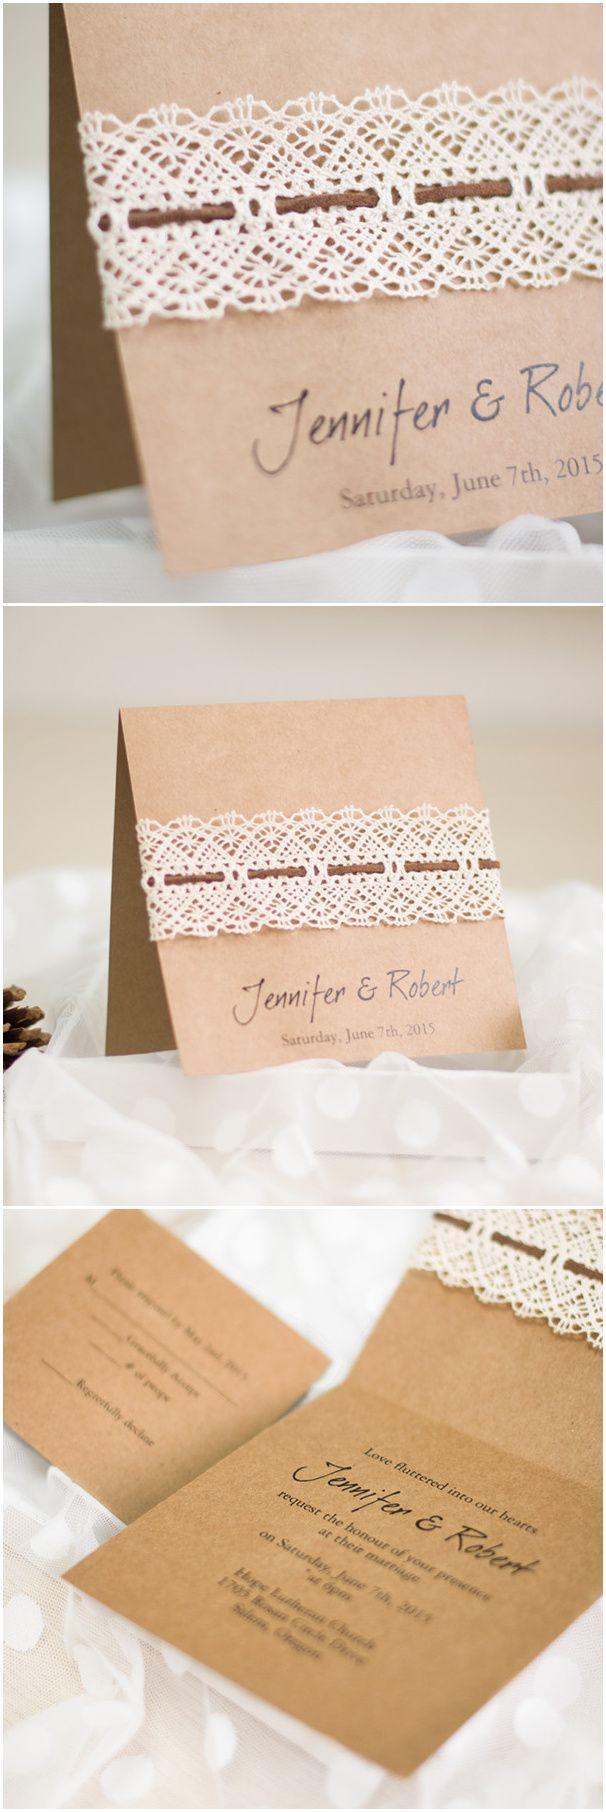 Свадьба - Affordable DIY Vintage Rustic Lace Folded Wedding Invitations EWLS044